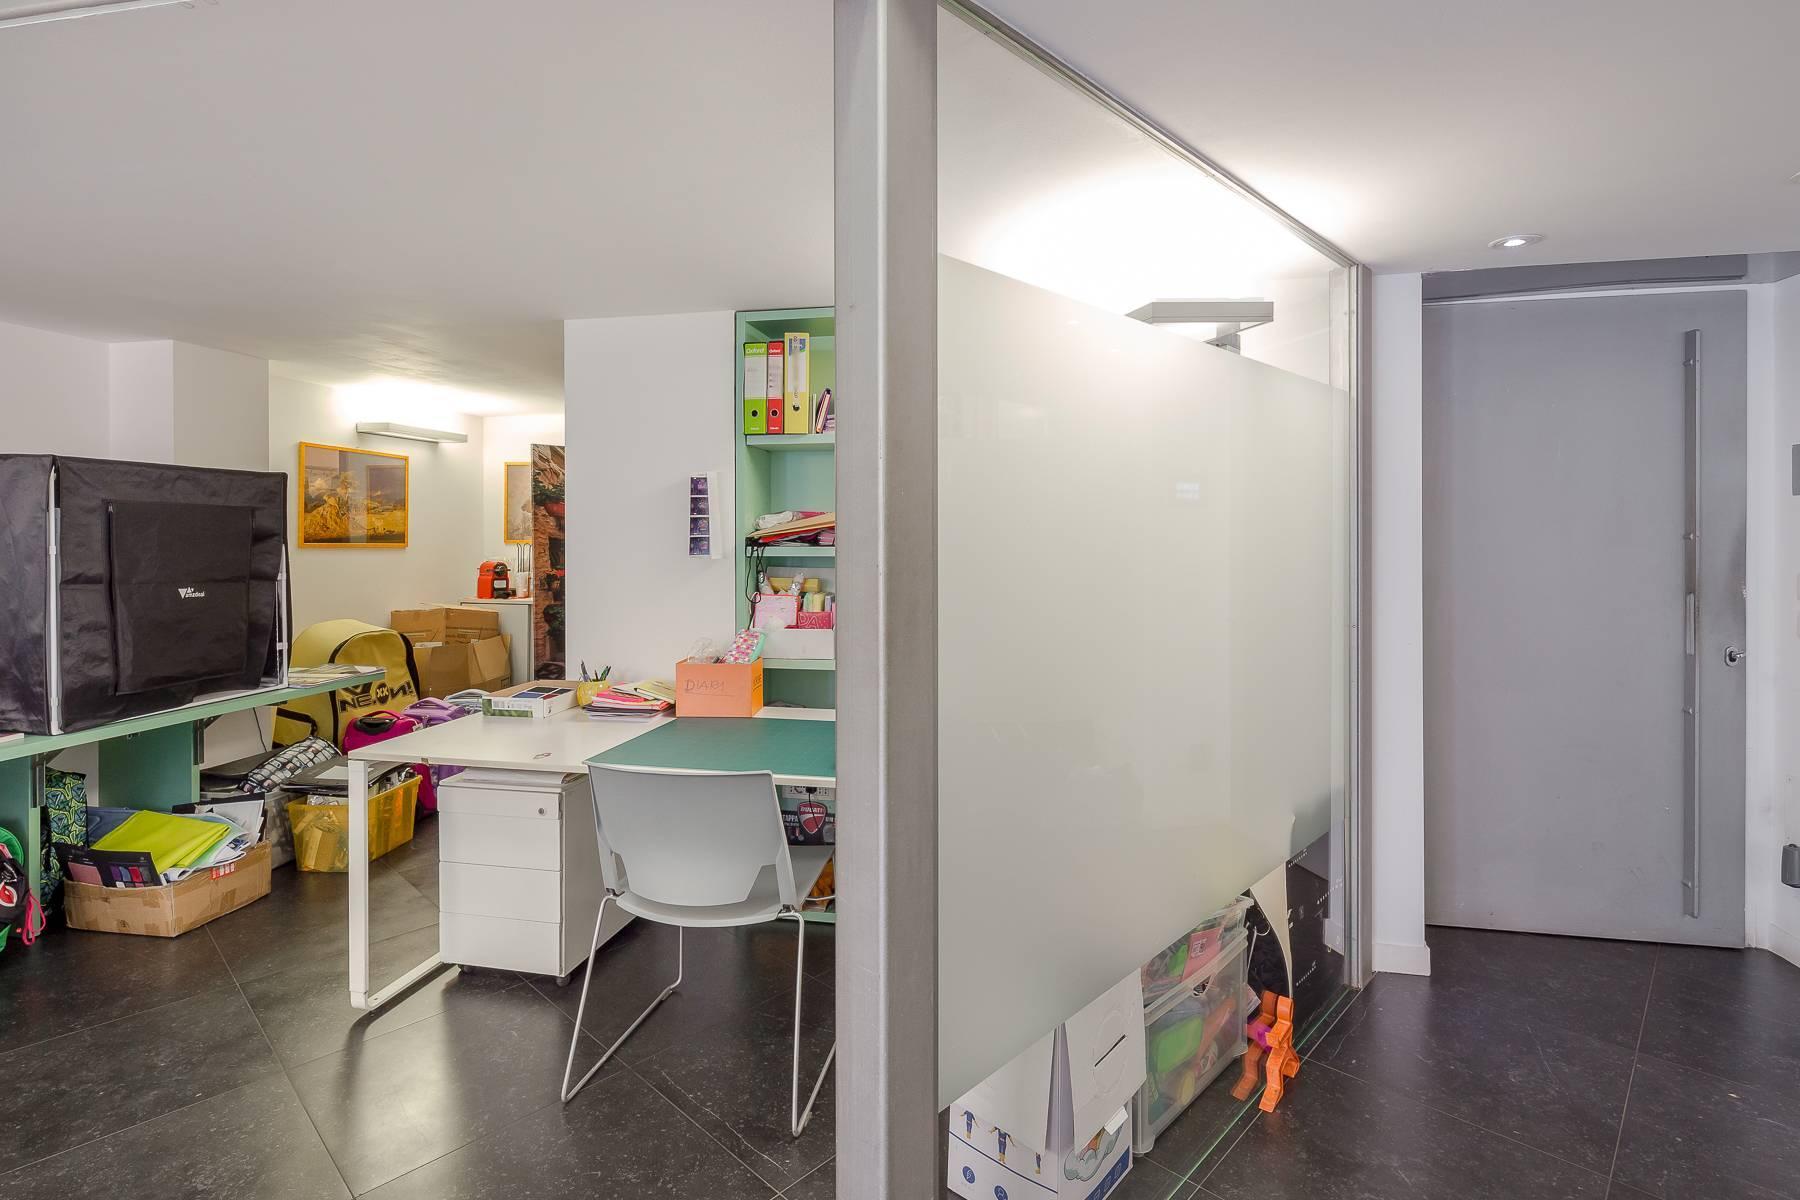 Opne-Space Büro / Wohnimmobilie auf der Piazza Giovine Italia / Via Aurelio Saffi - 19